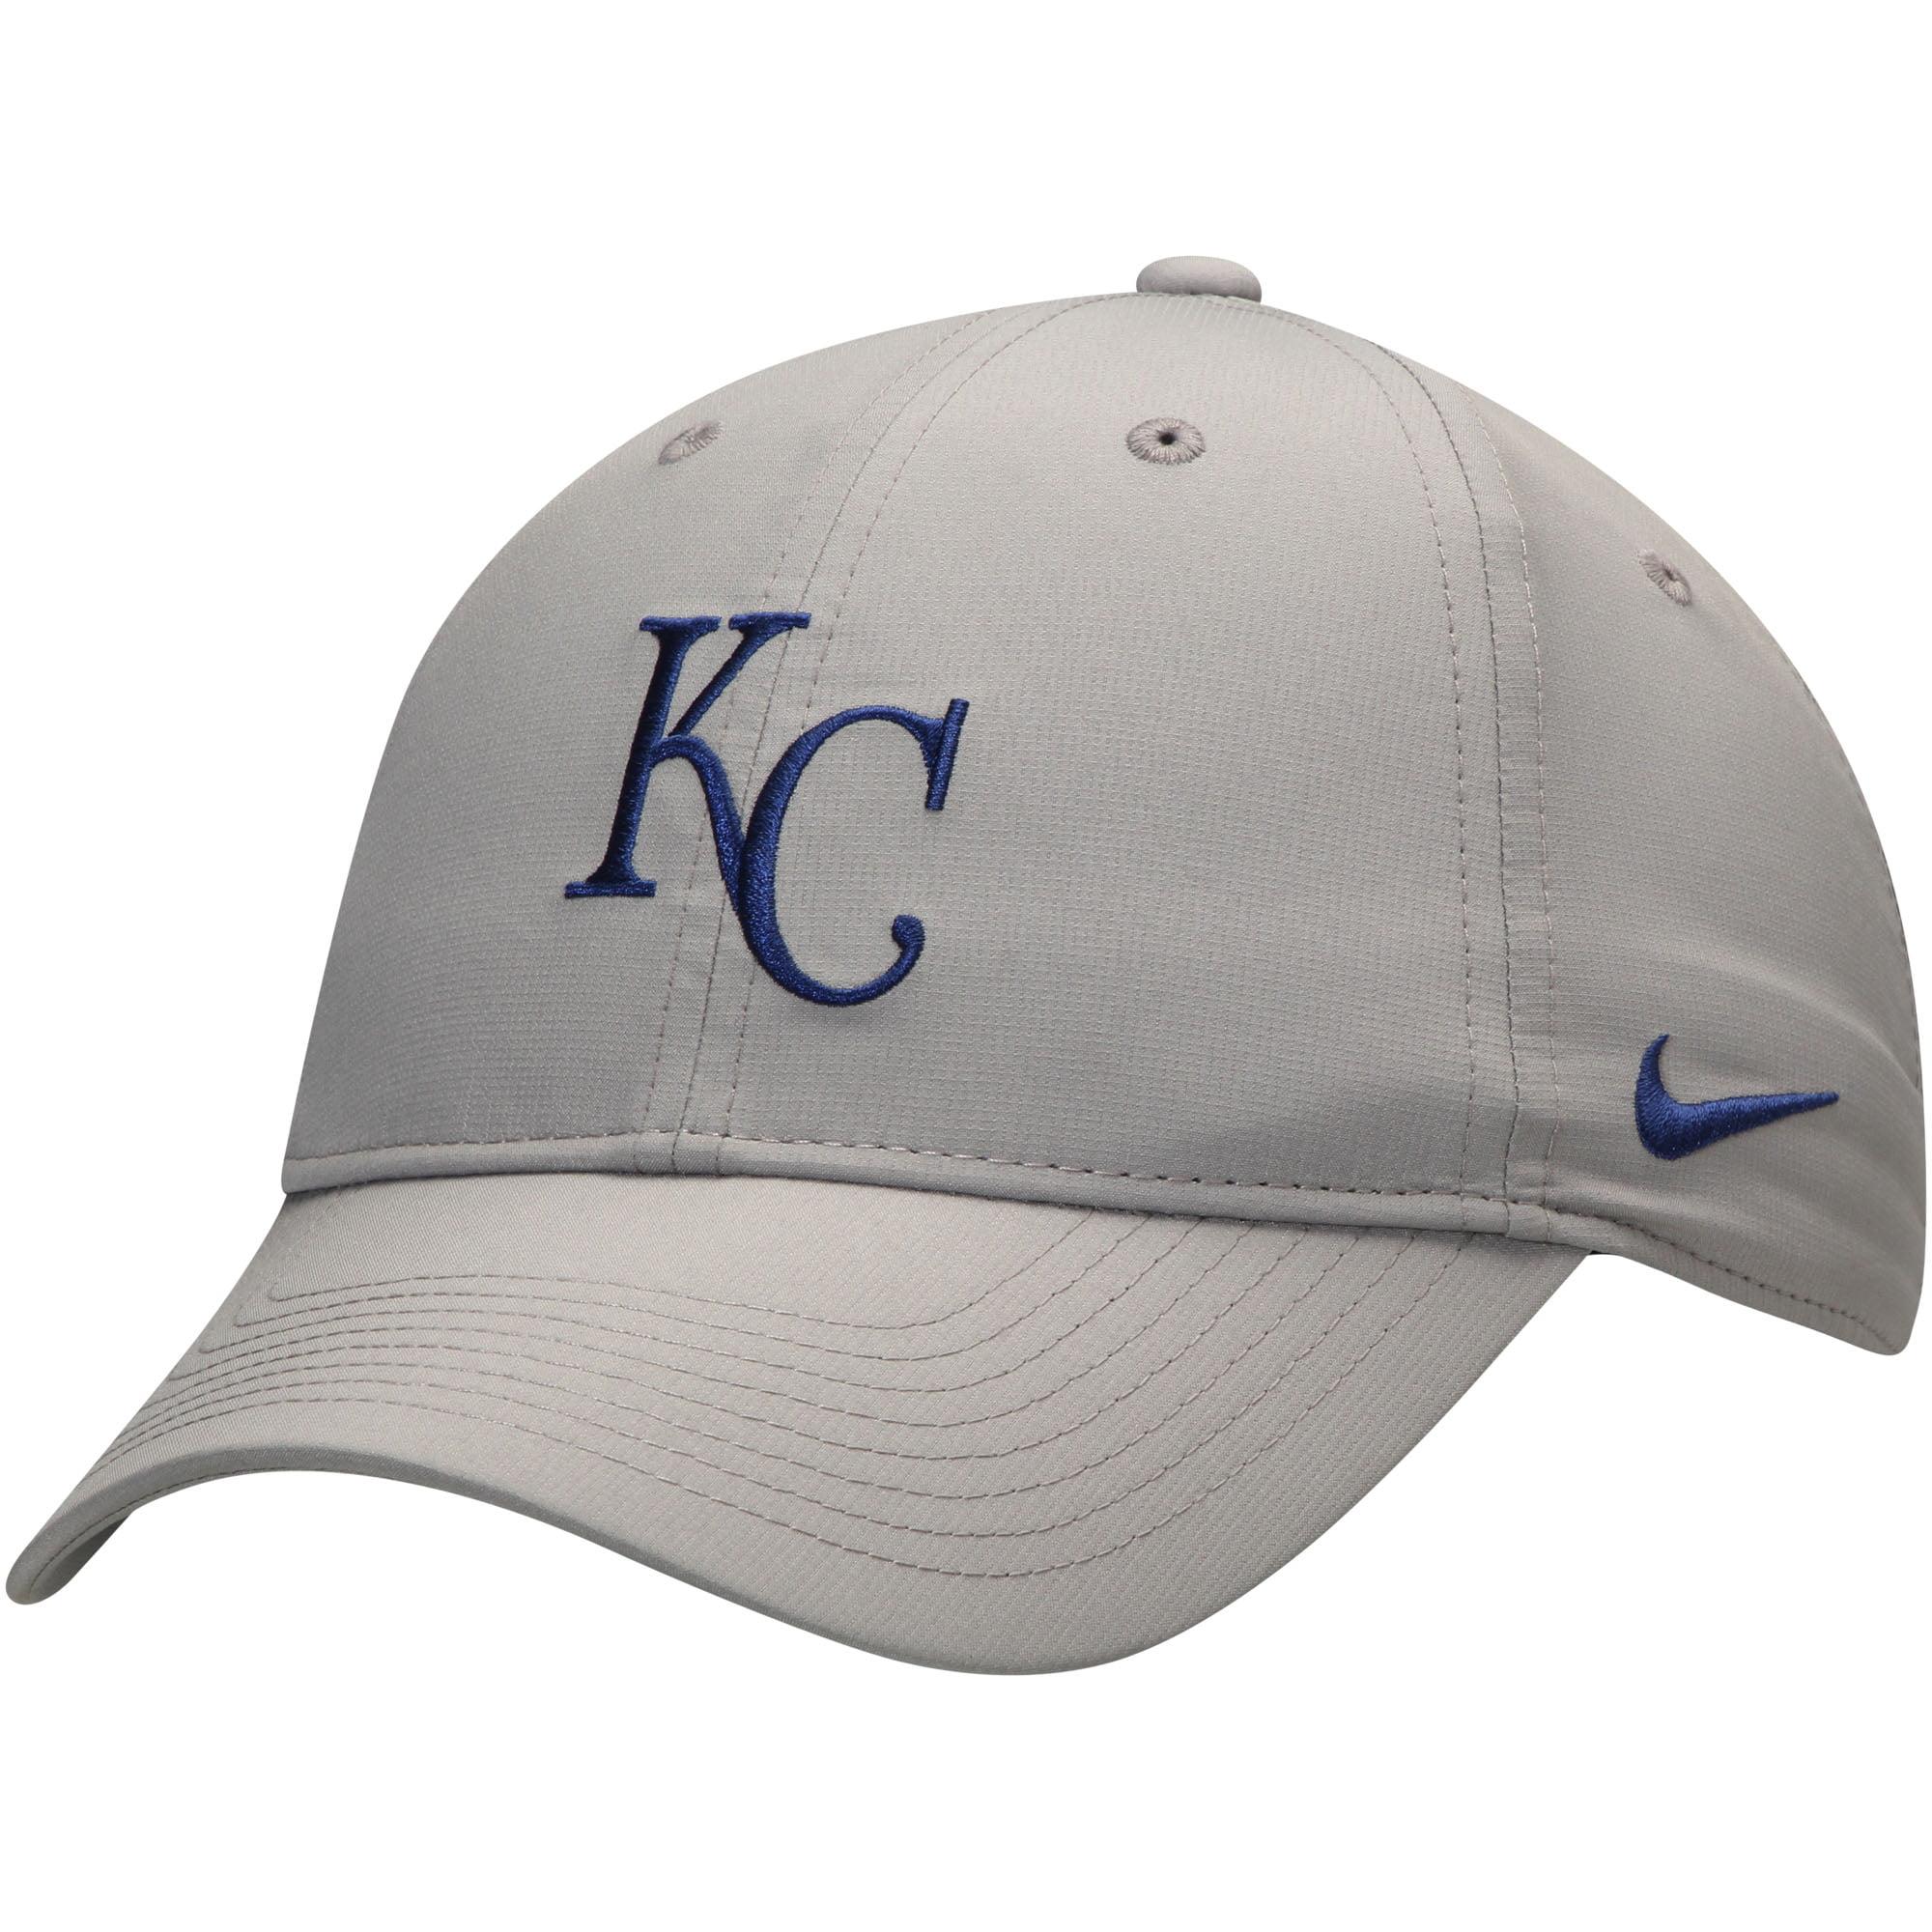 94c38ed6 Kansas City Royals Nike Legacy 91 Adjustable Performance Hat - Gray - OSFA